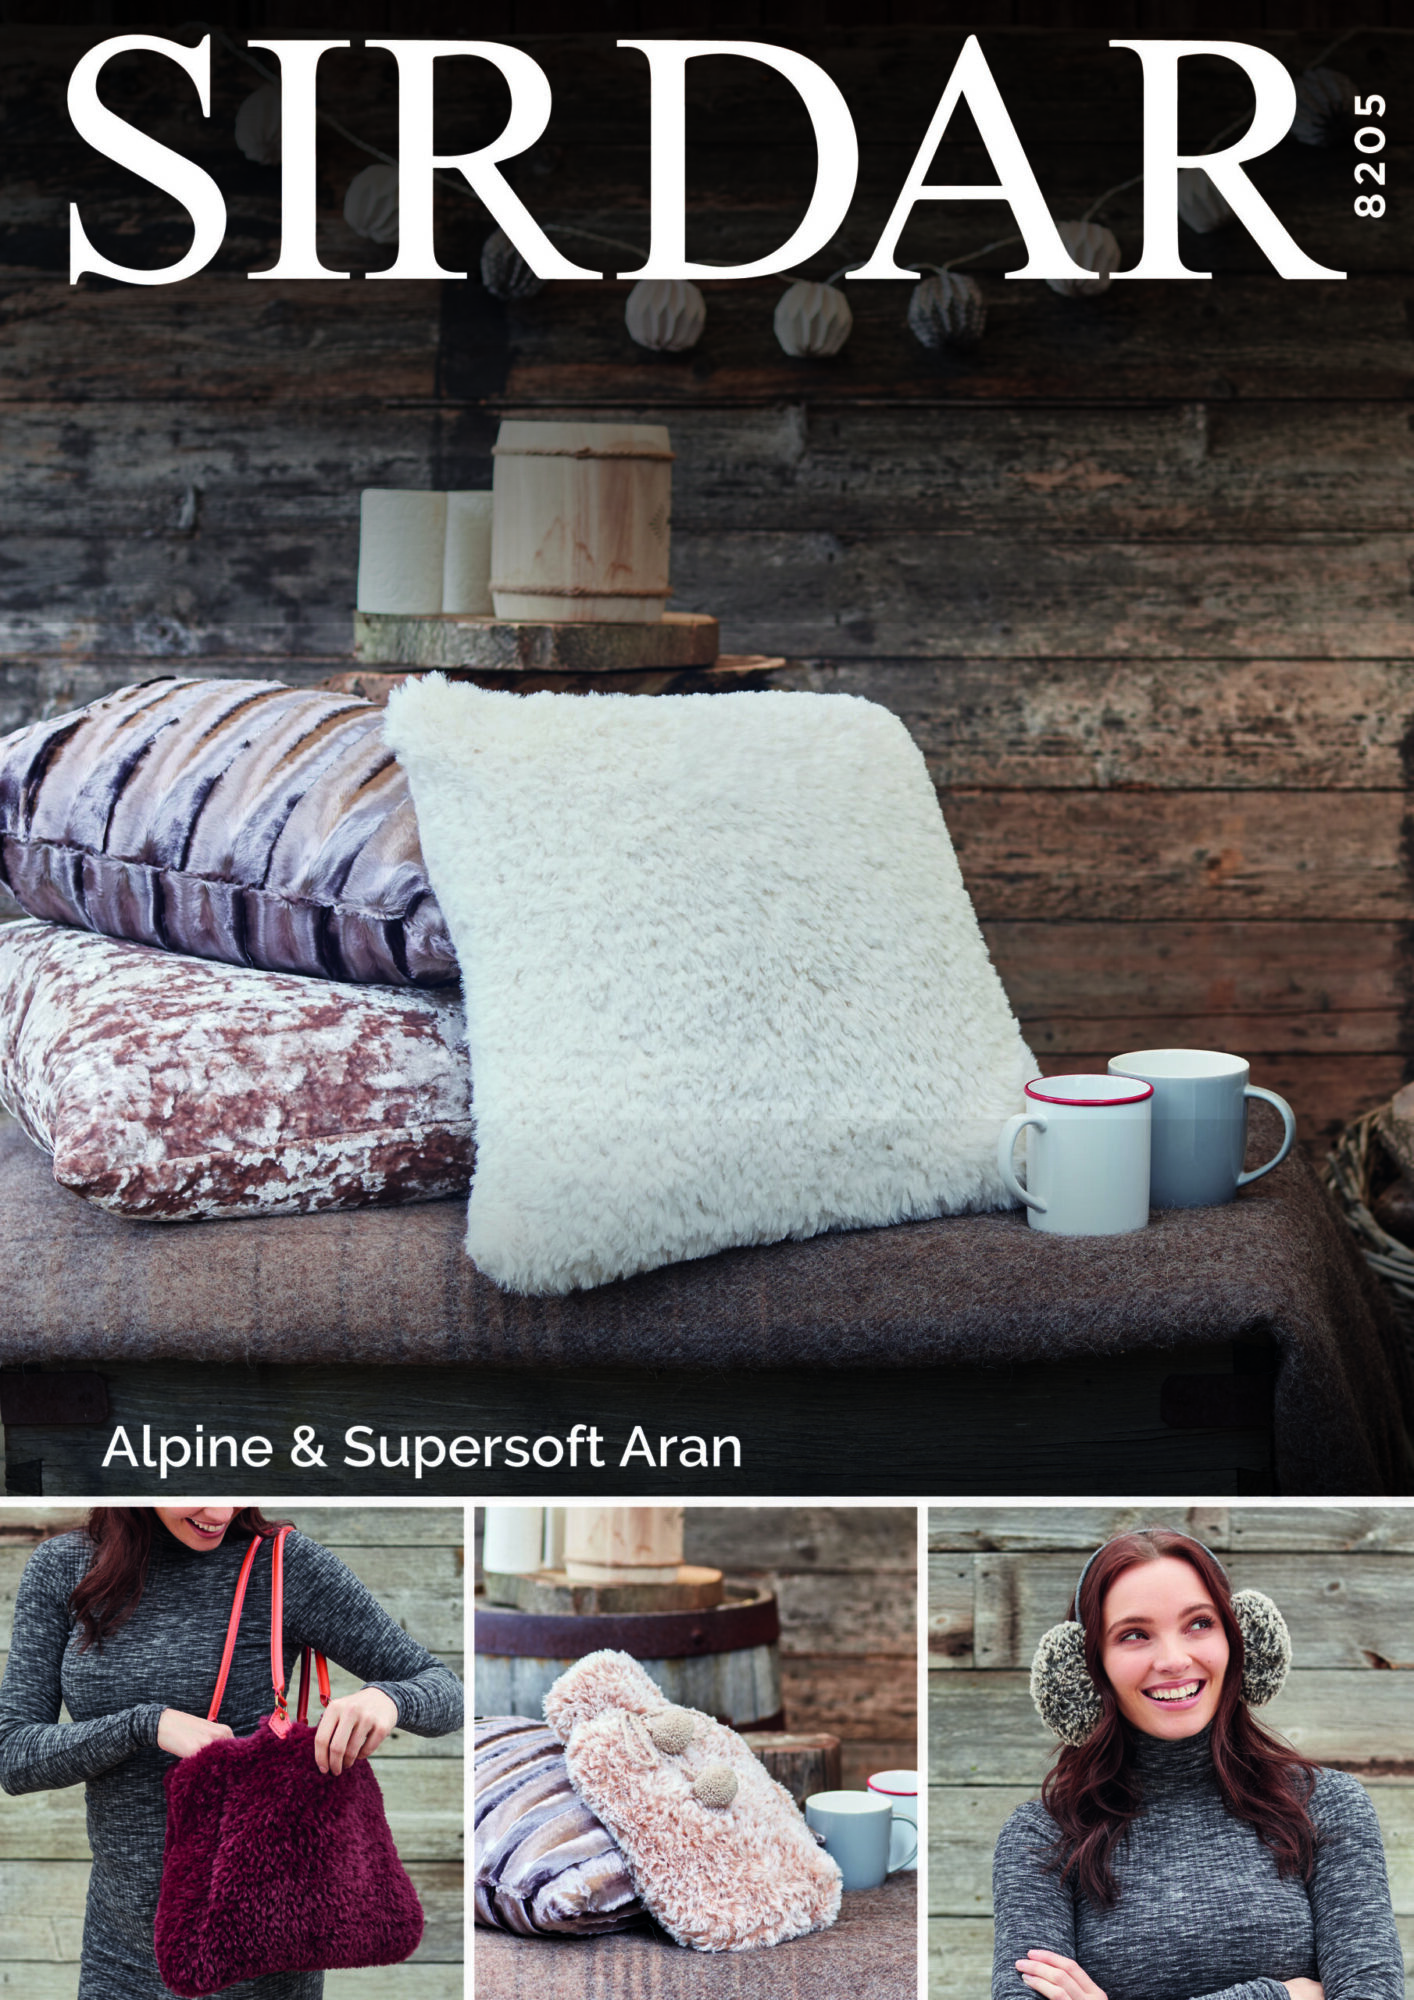 Sirdar Pattern Alpine 8205 (Download) product image